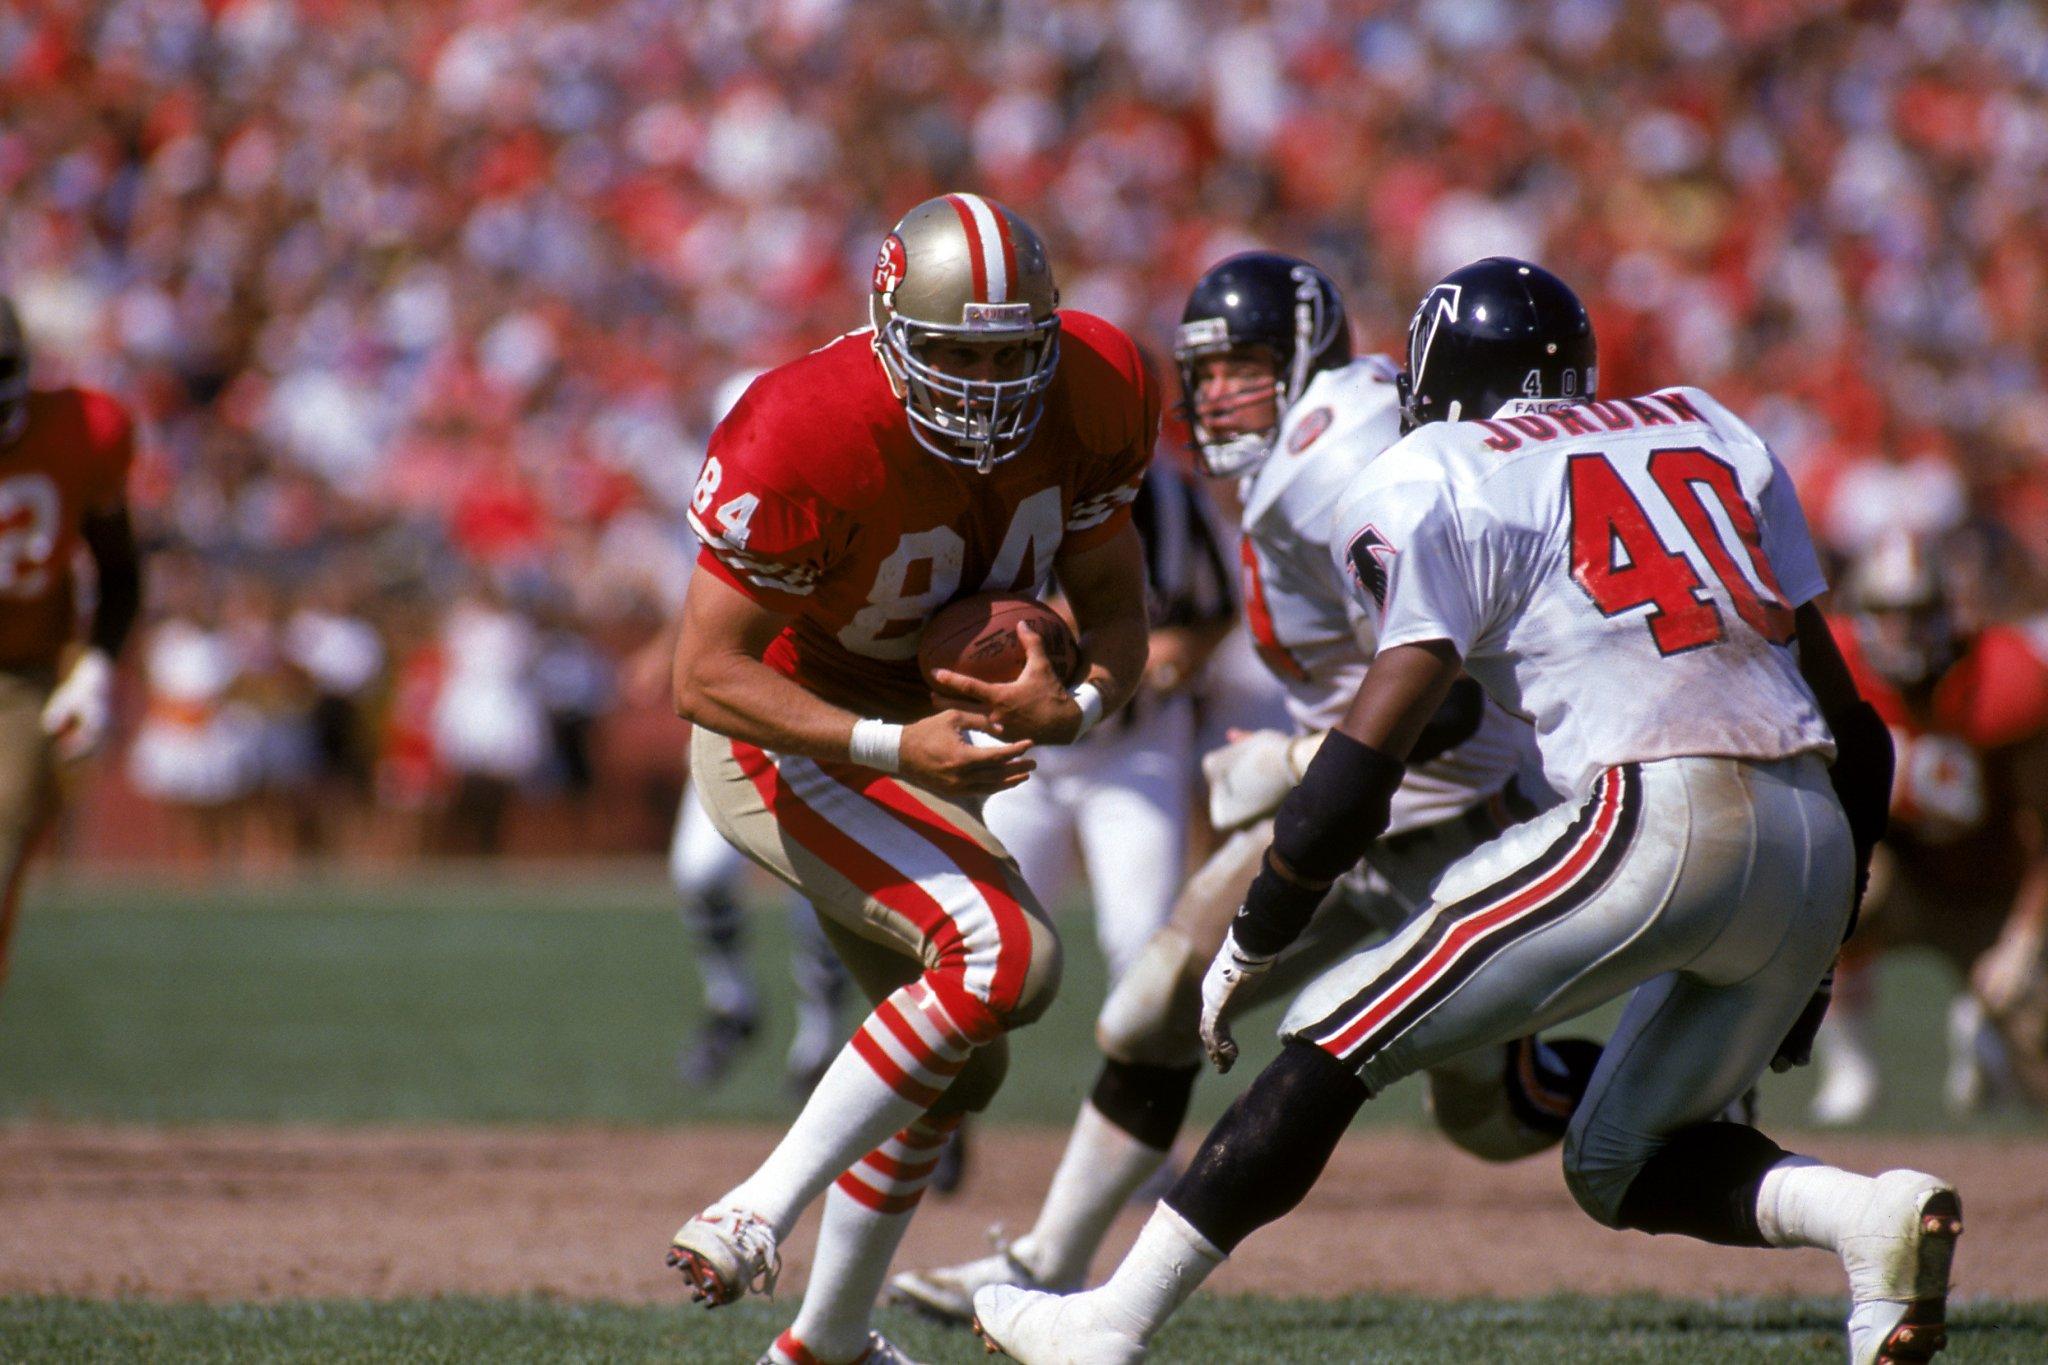 49ers legend Brent Jones breaks down Super Bowl tight ends Kittle, Kelce